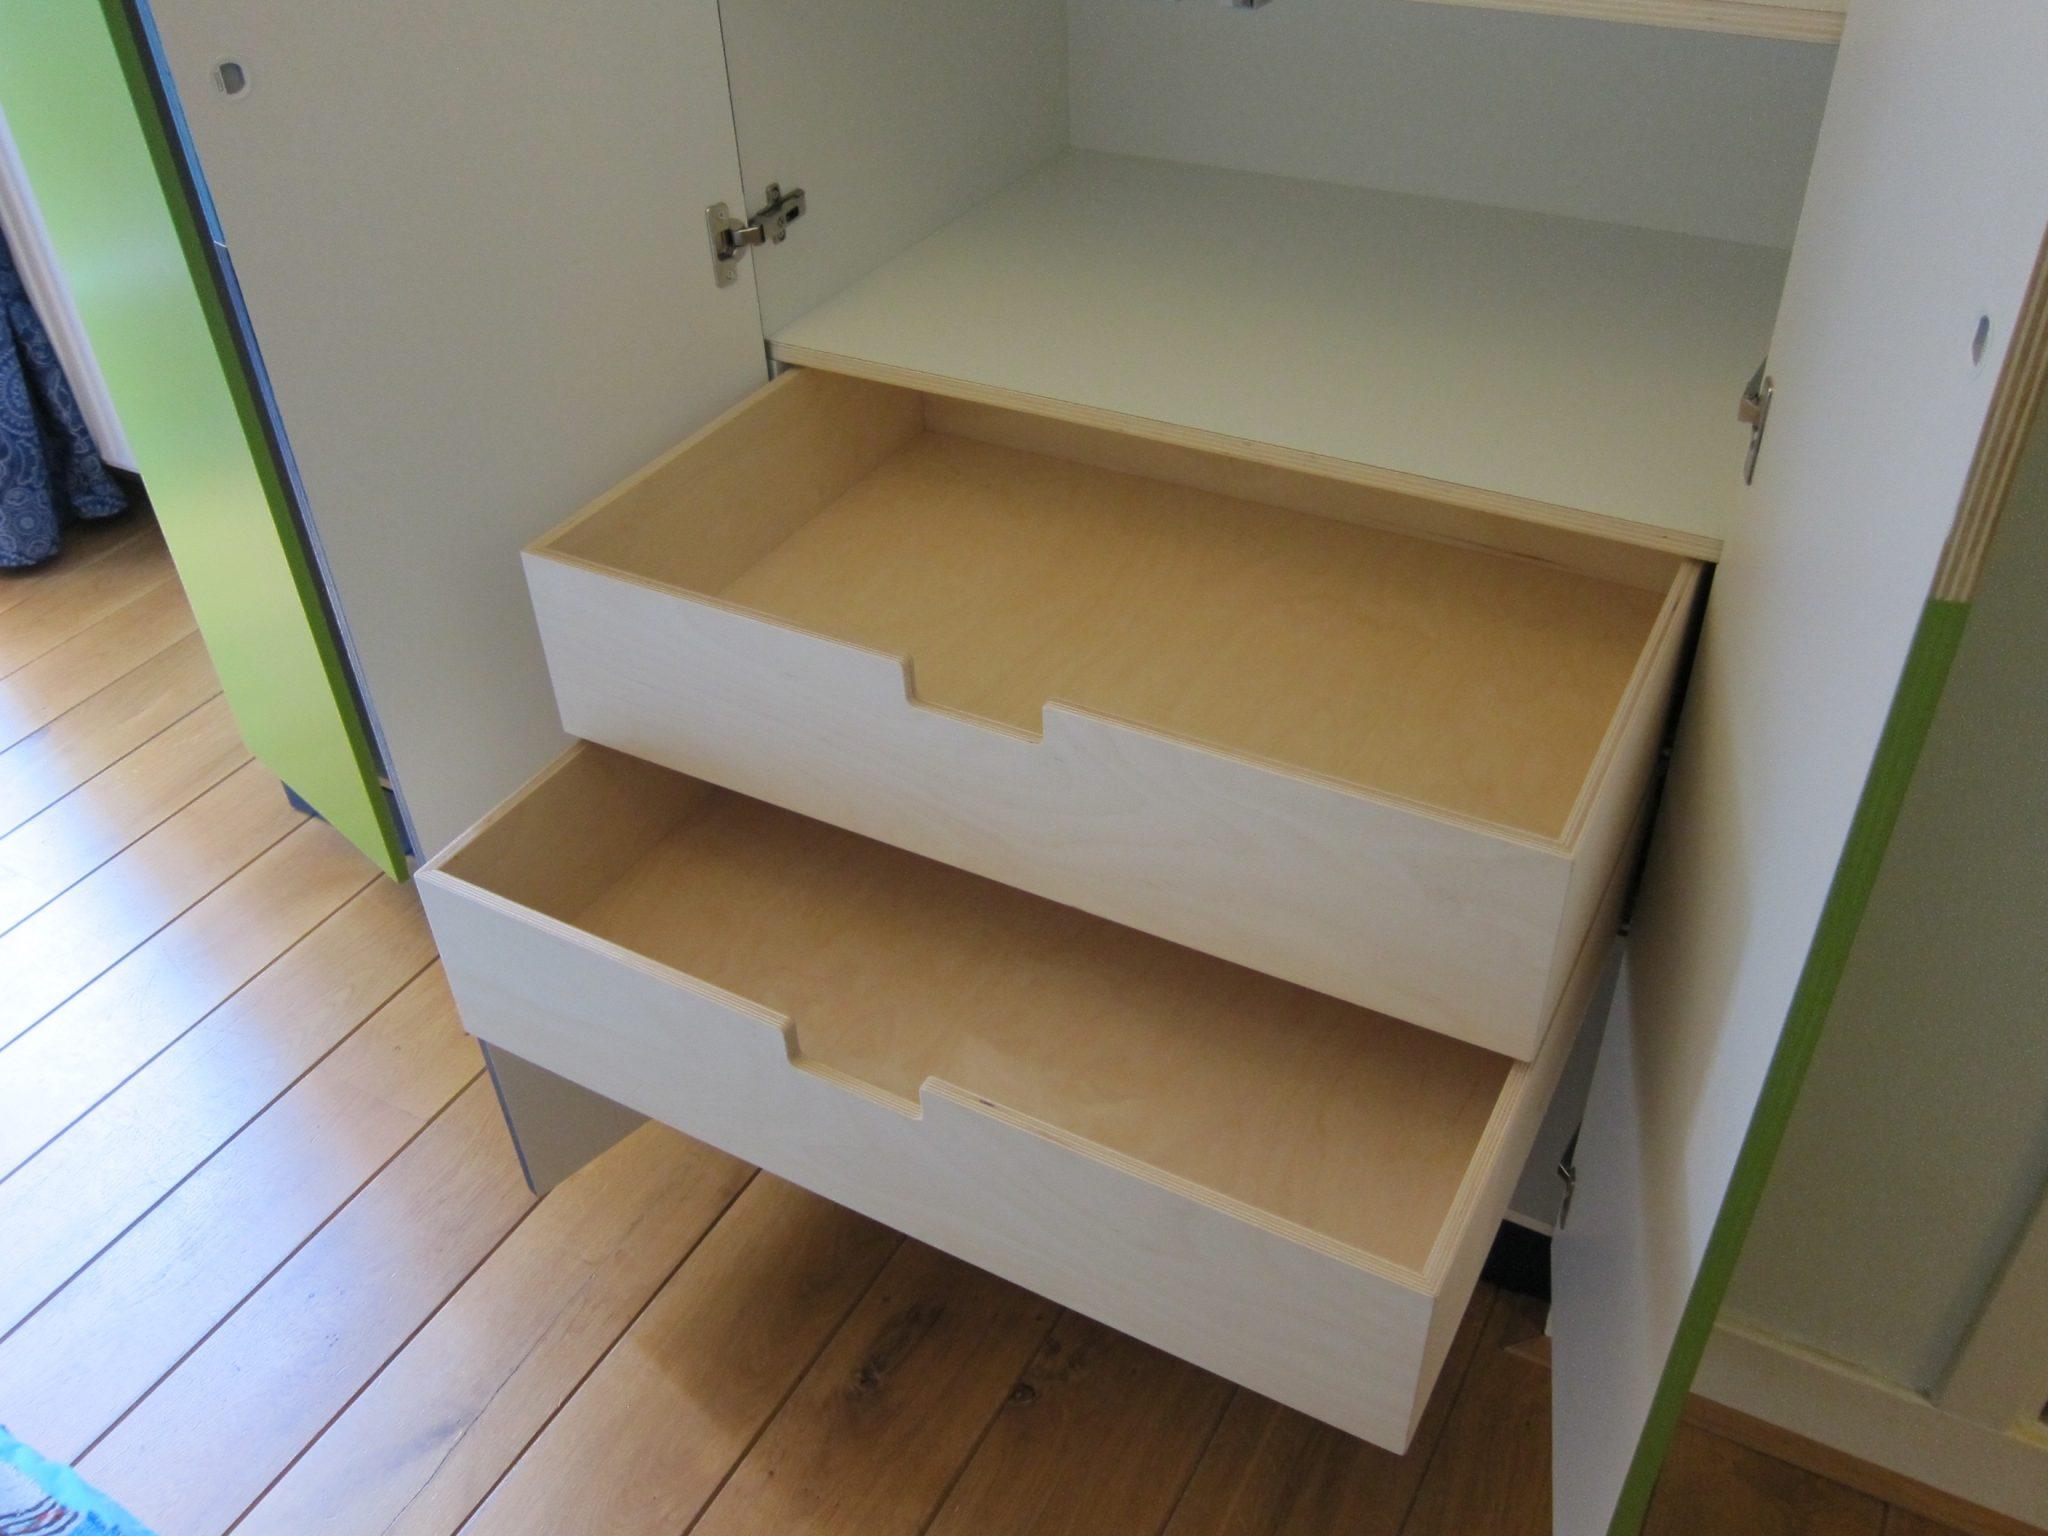 Kledingkast vincent niekerk meubelmaker amsterdam for Meubelmaker amsterdam